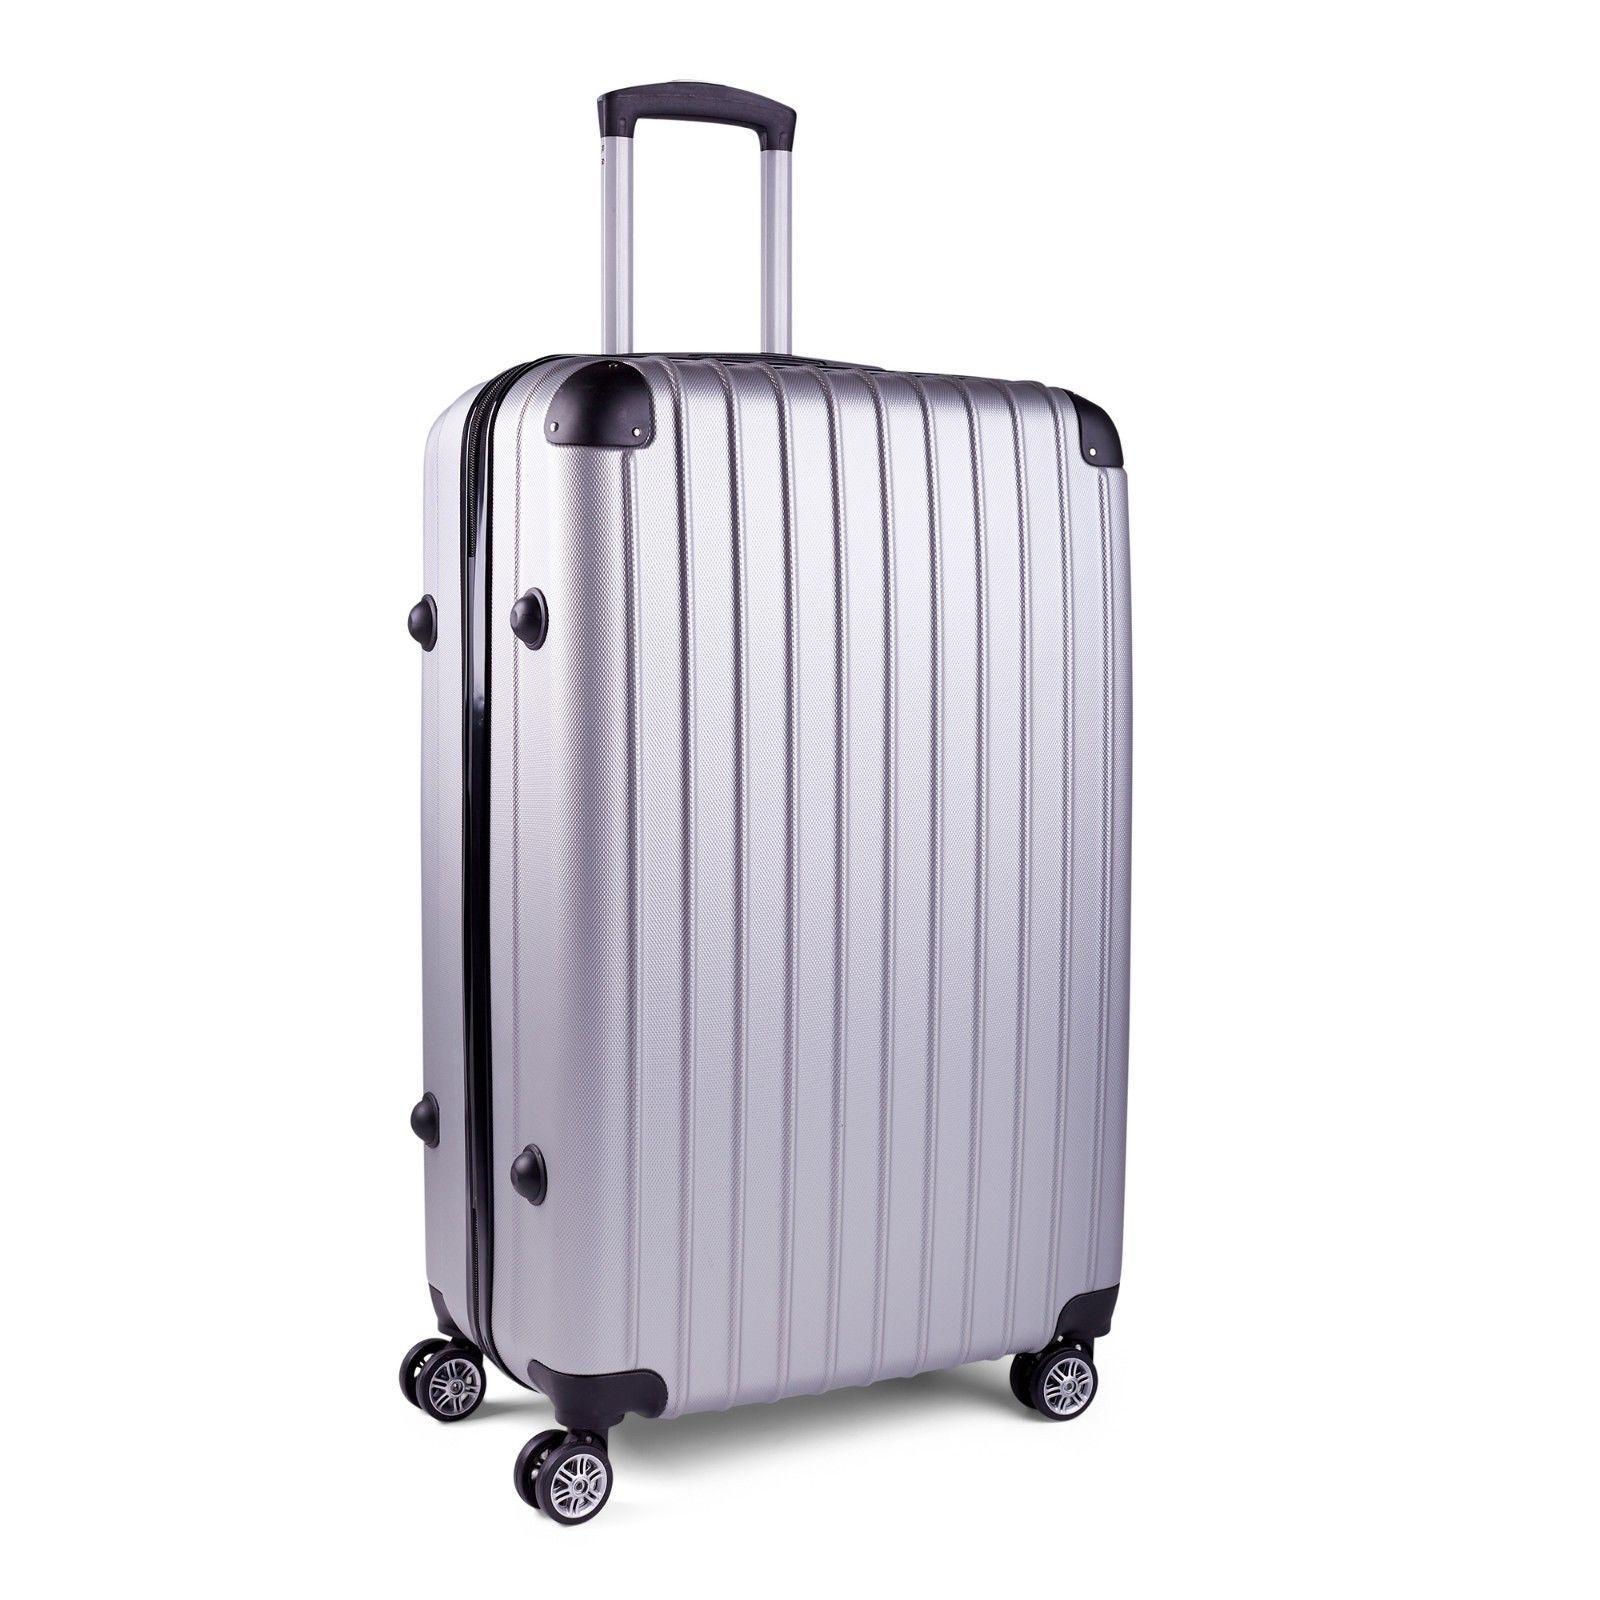 Milano-Premium-3pc-ABS-Luggage-Suitcase-Luxury-Hard-Case-Shockproof-Travel-Set thumbnail 32